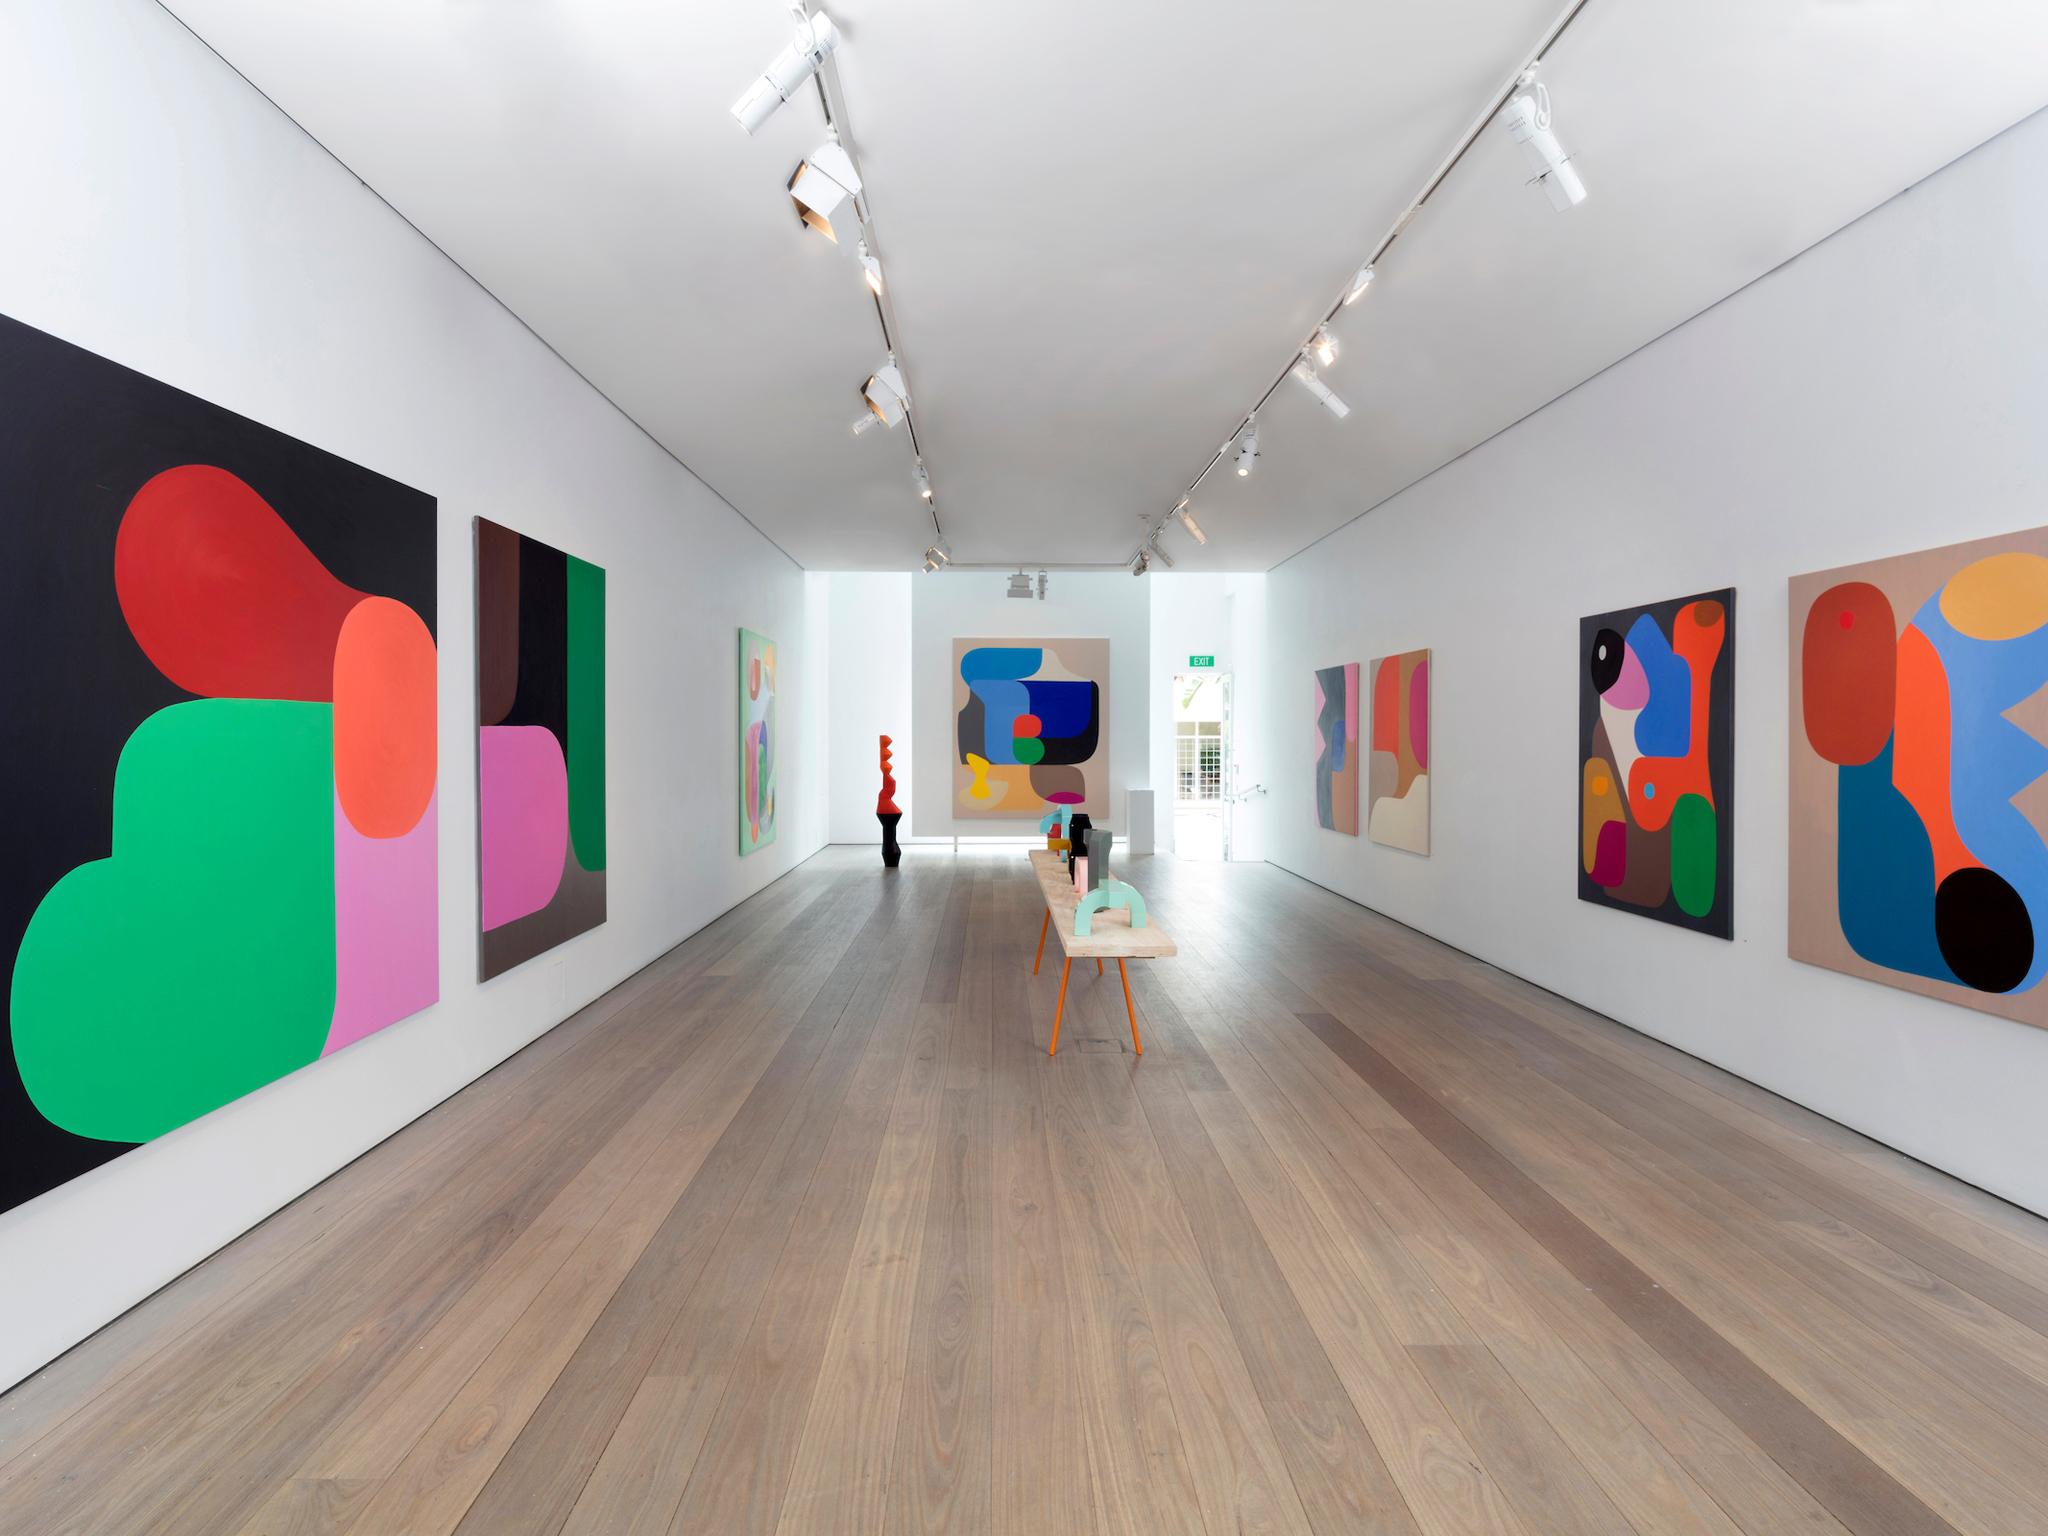 Olsen Gallery